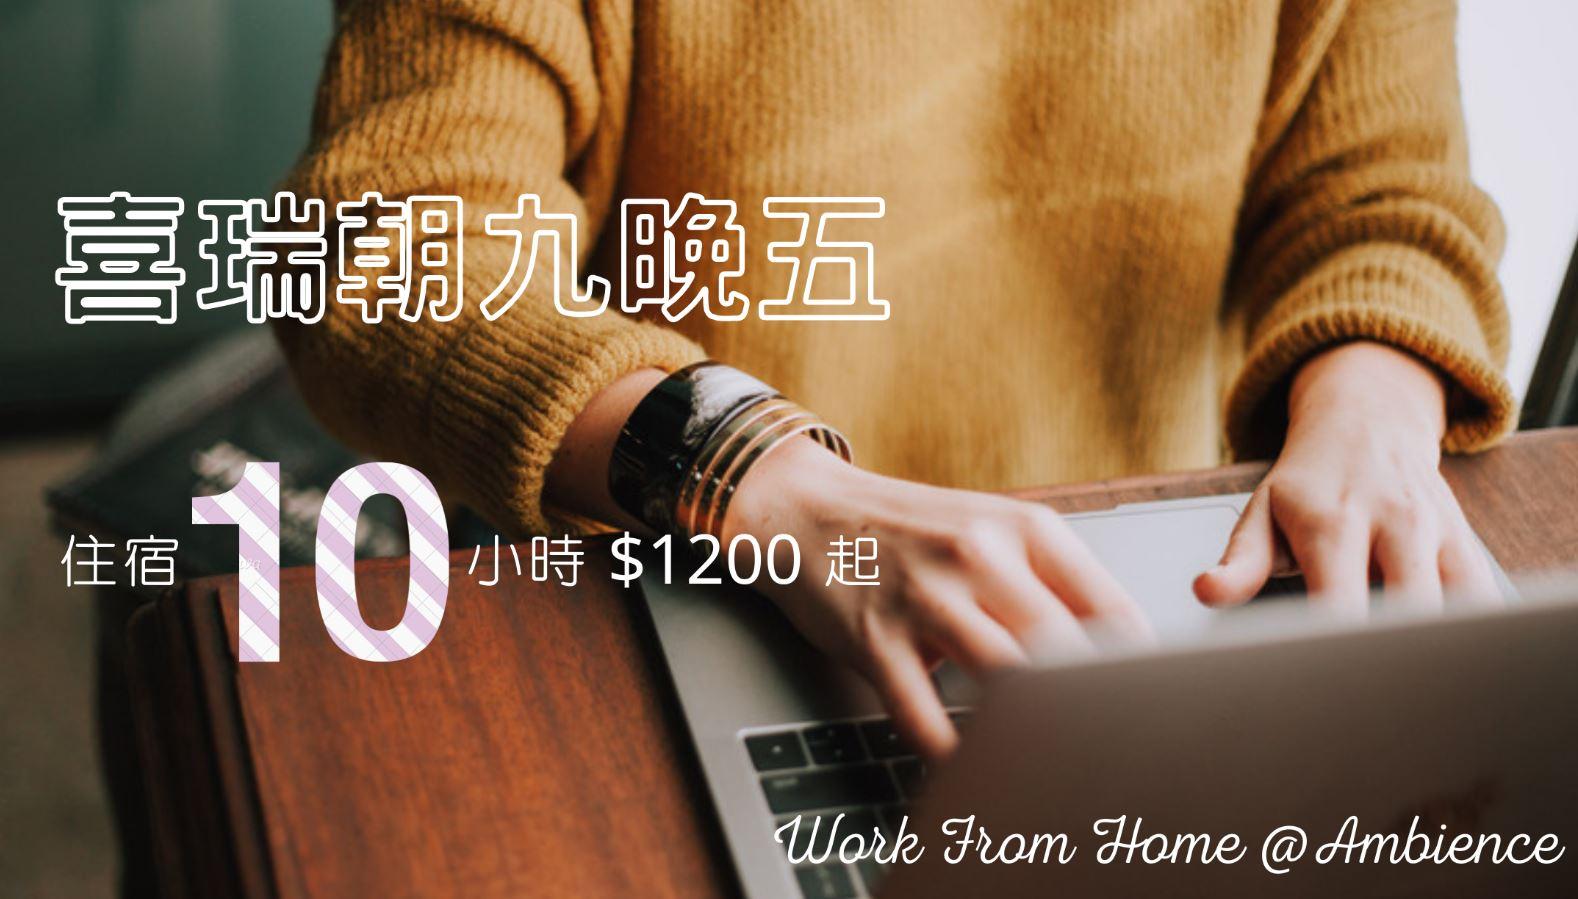 https://booking.taipeiinngroup.com/nv/images/suite/996.jpg